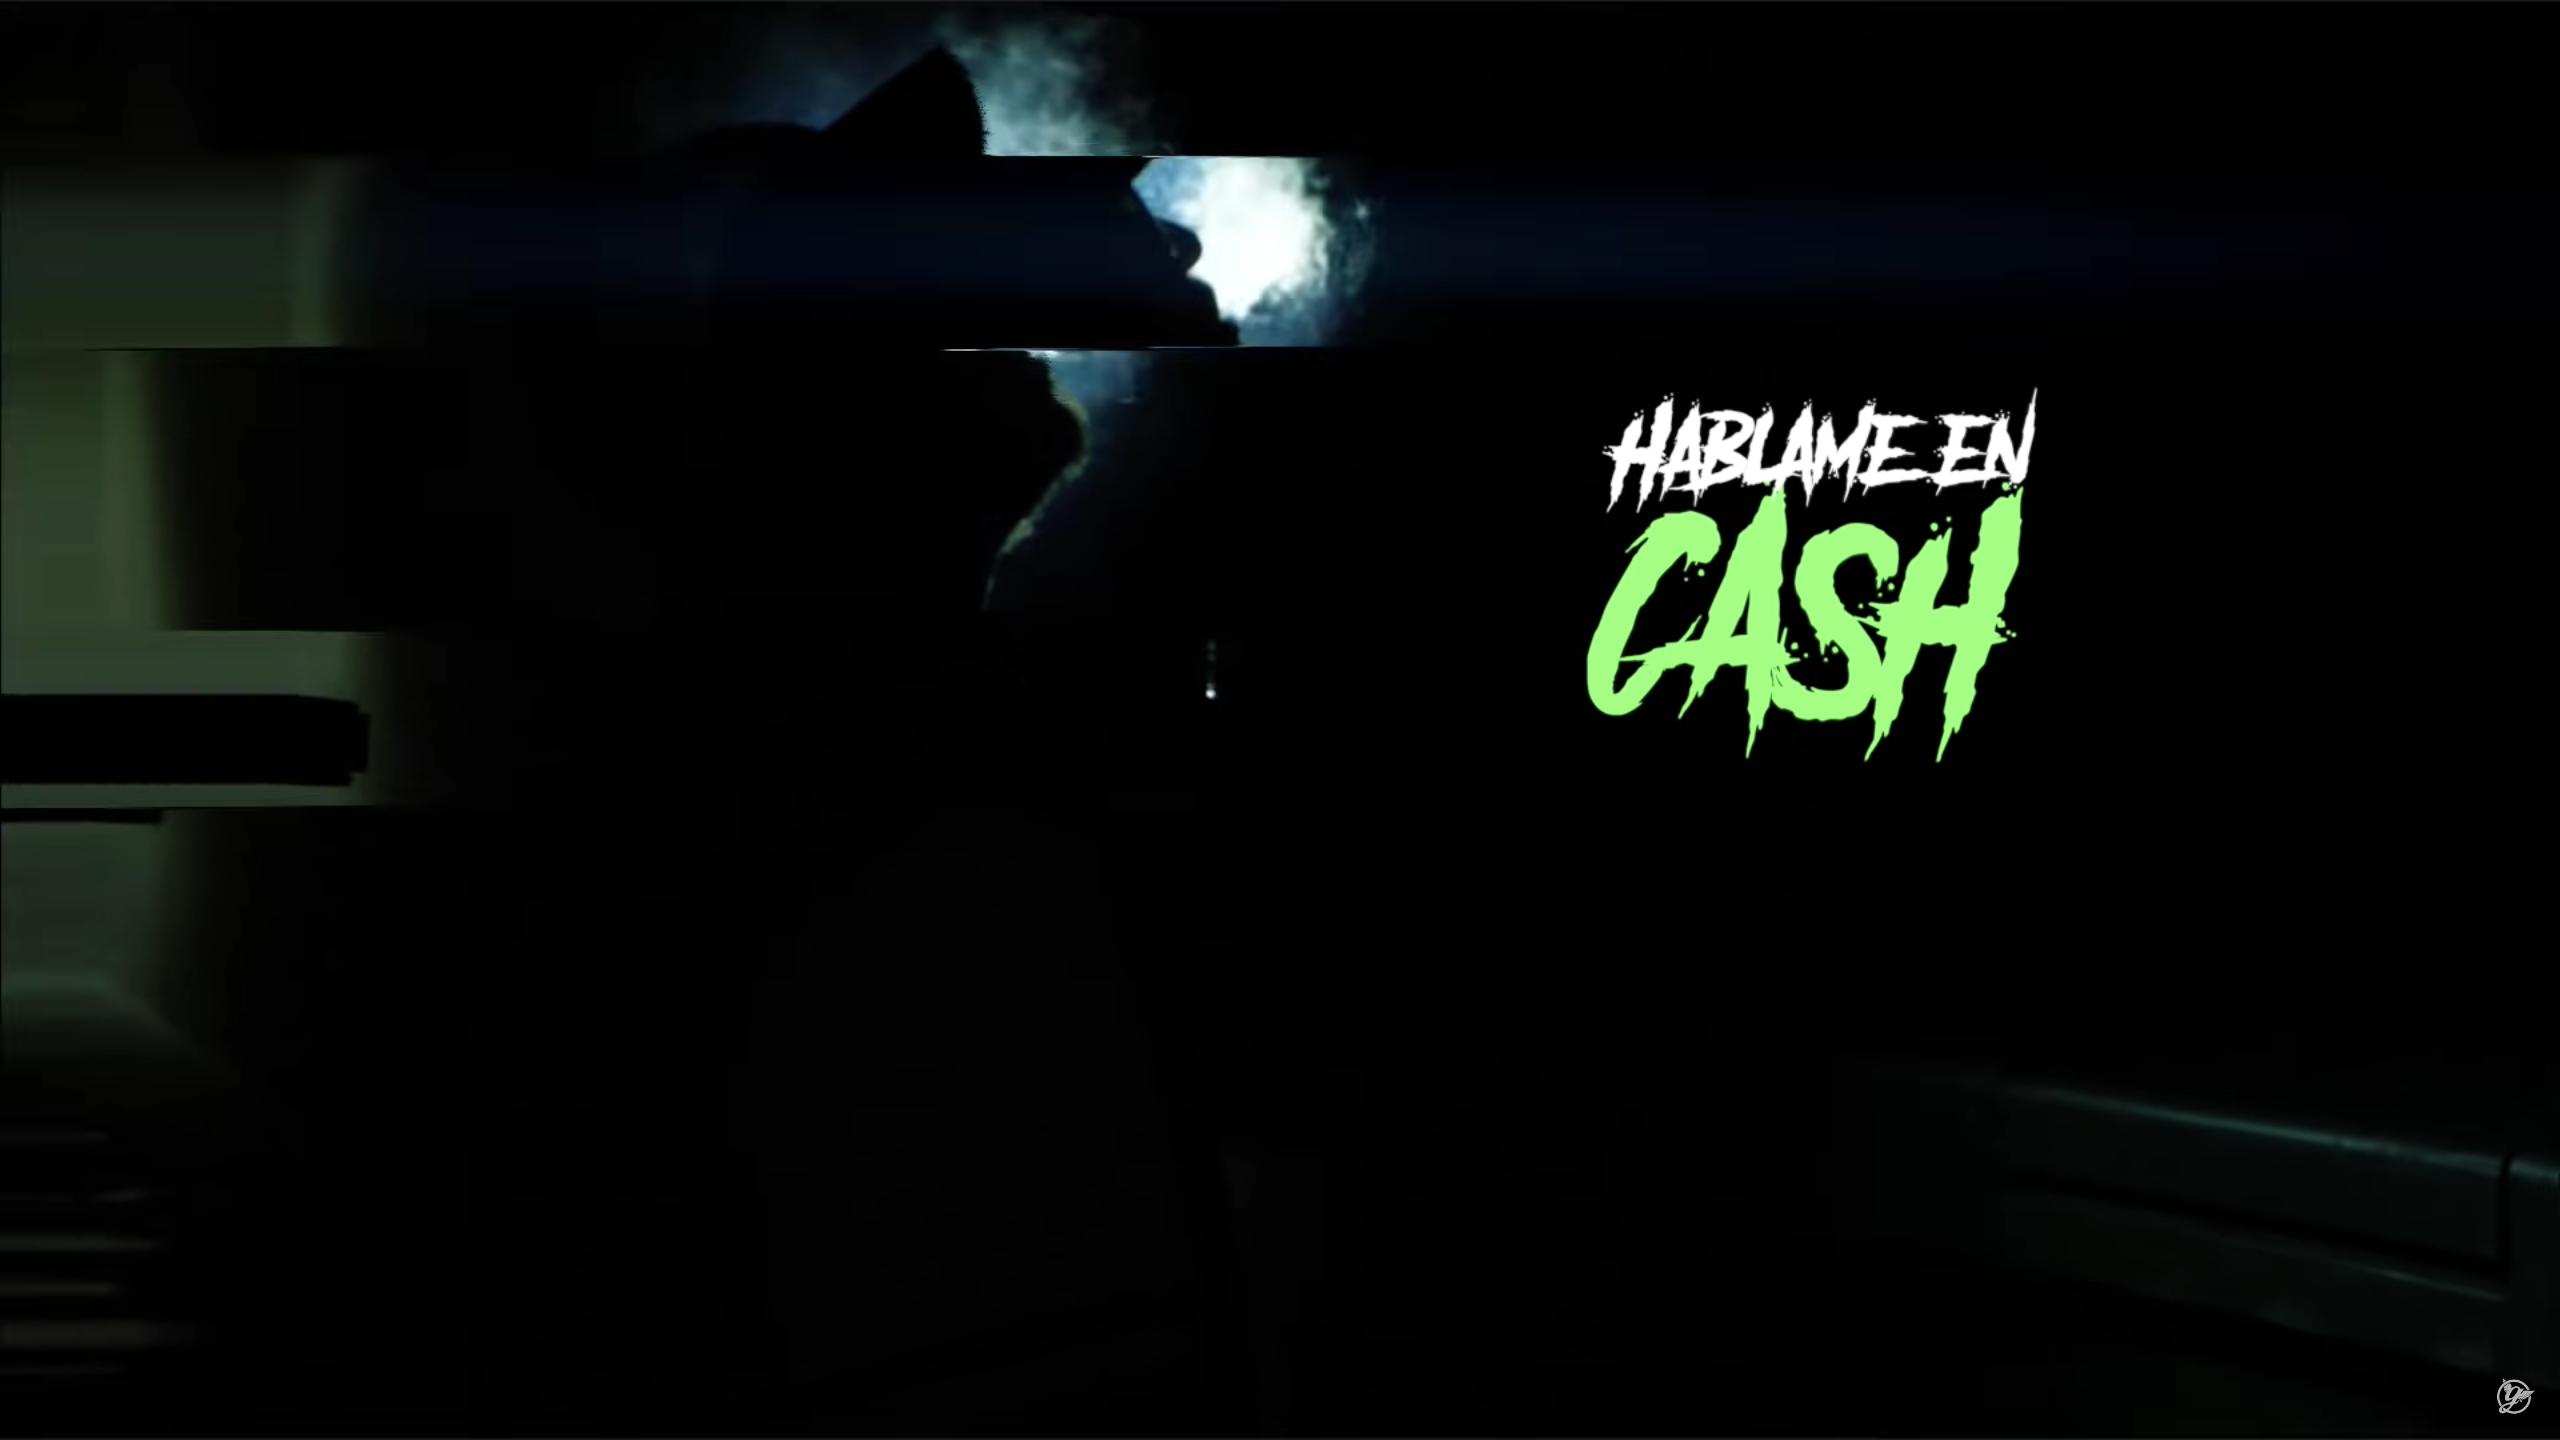 Hablame en cash - xcese